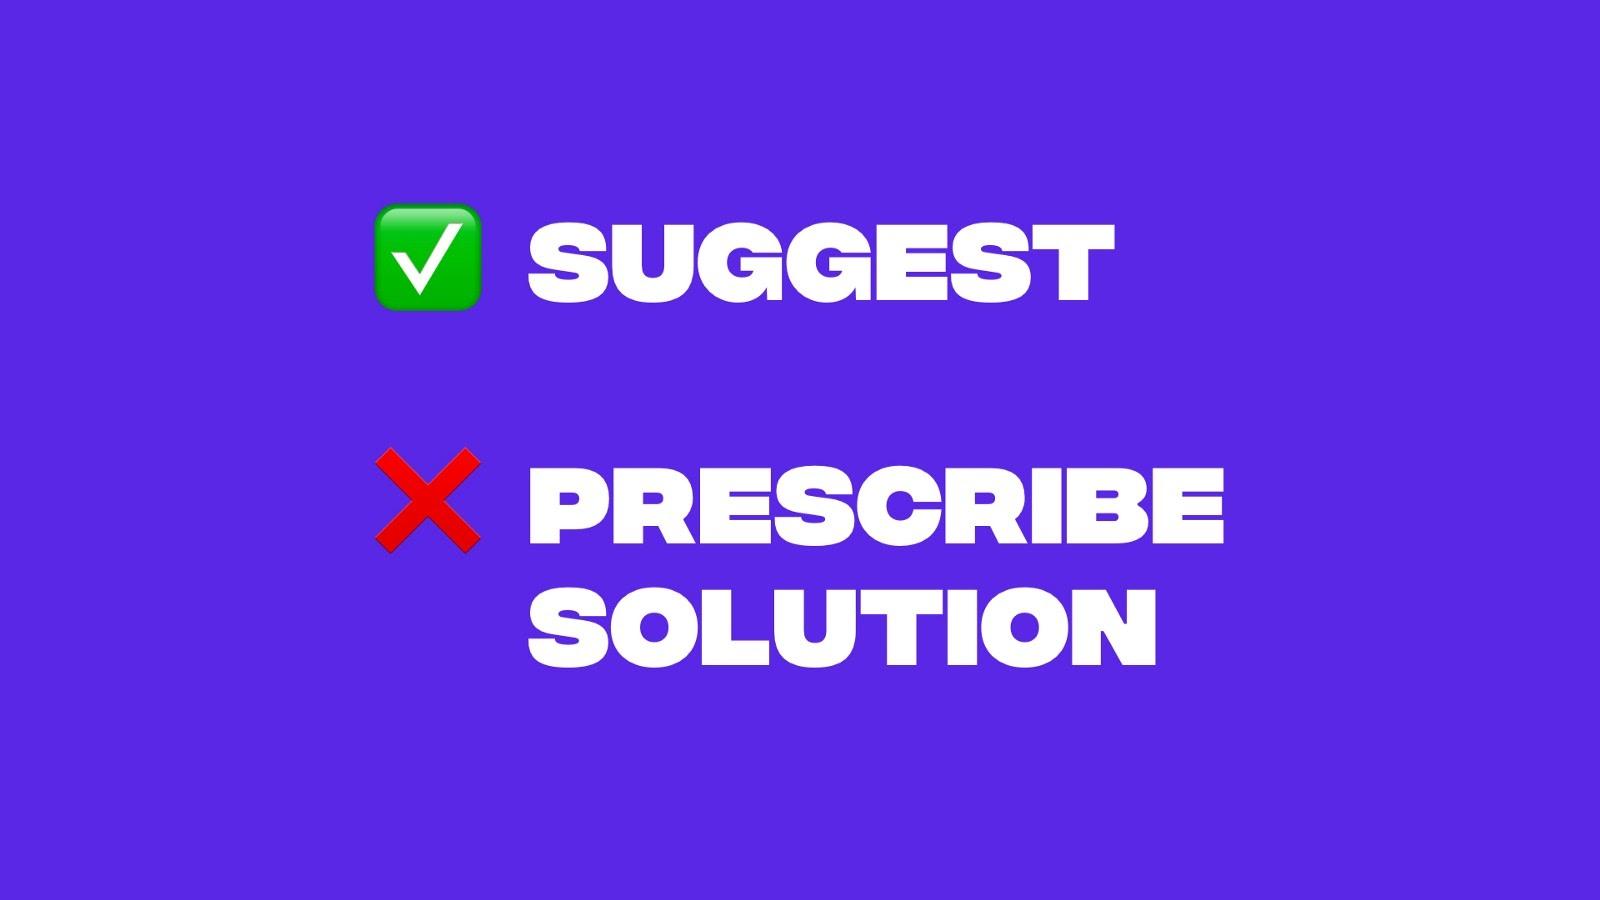 Make suggestions vs immediately prescribing solutions